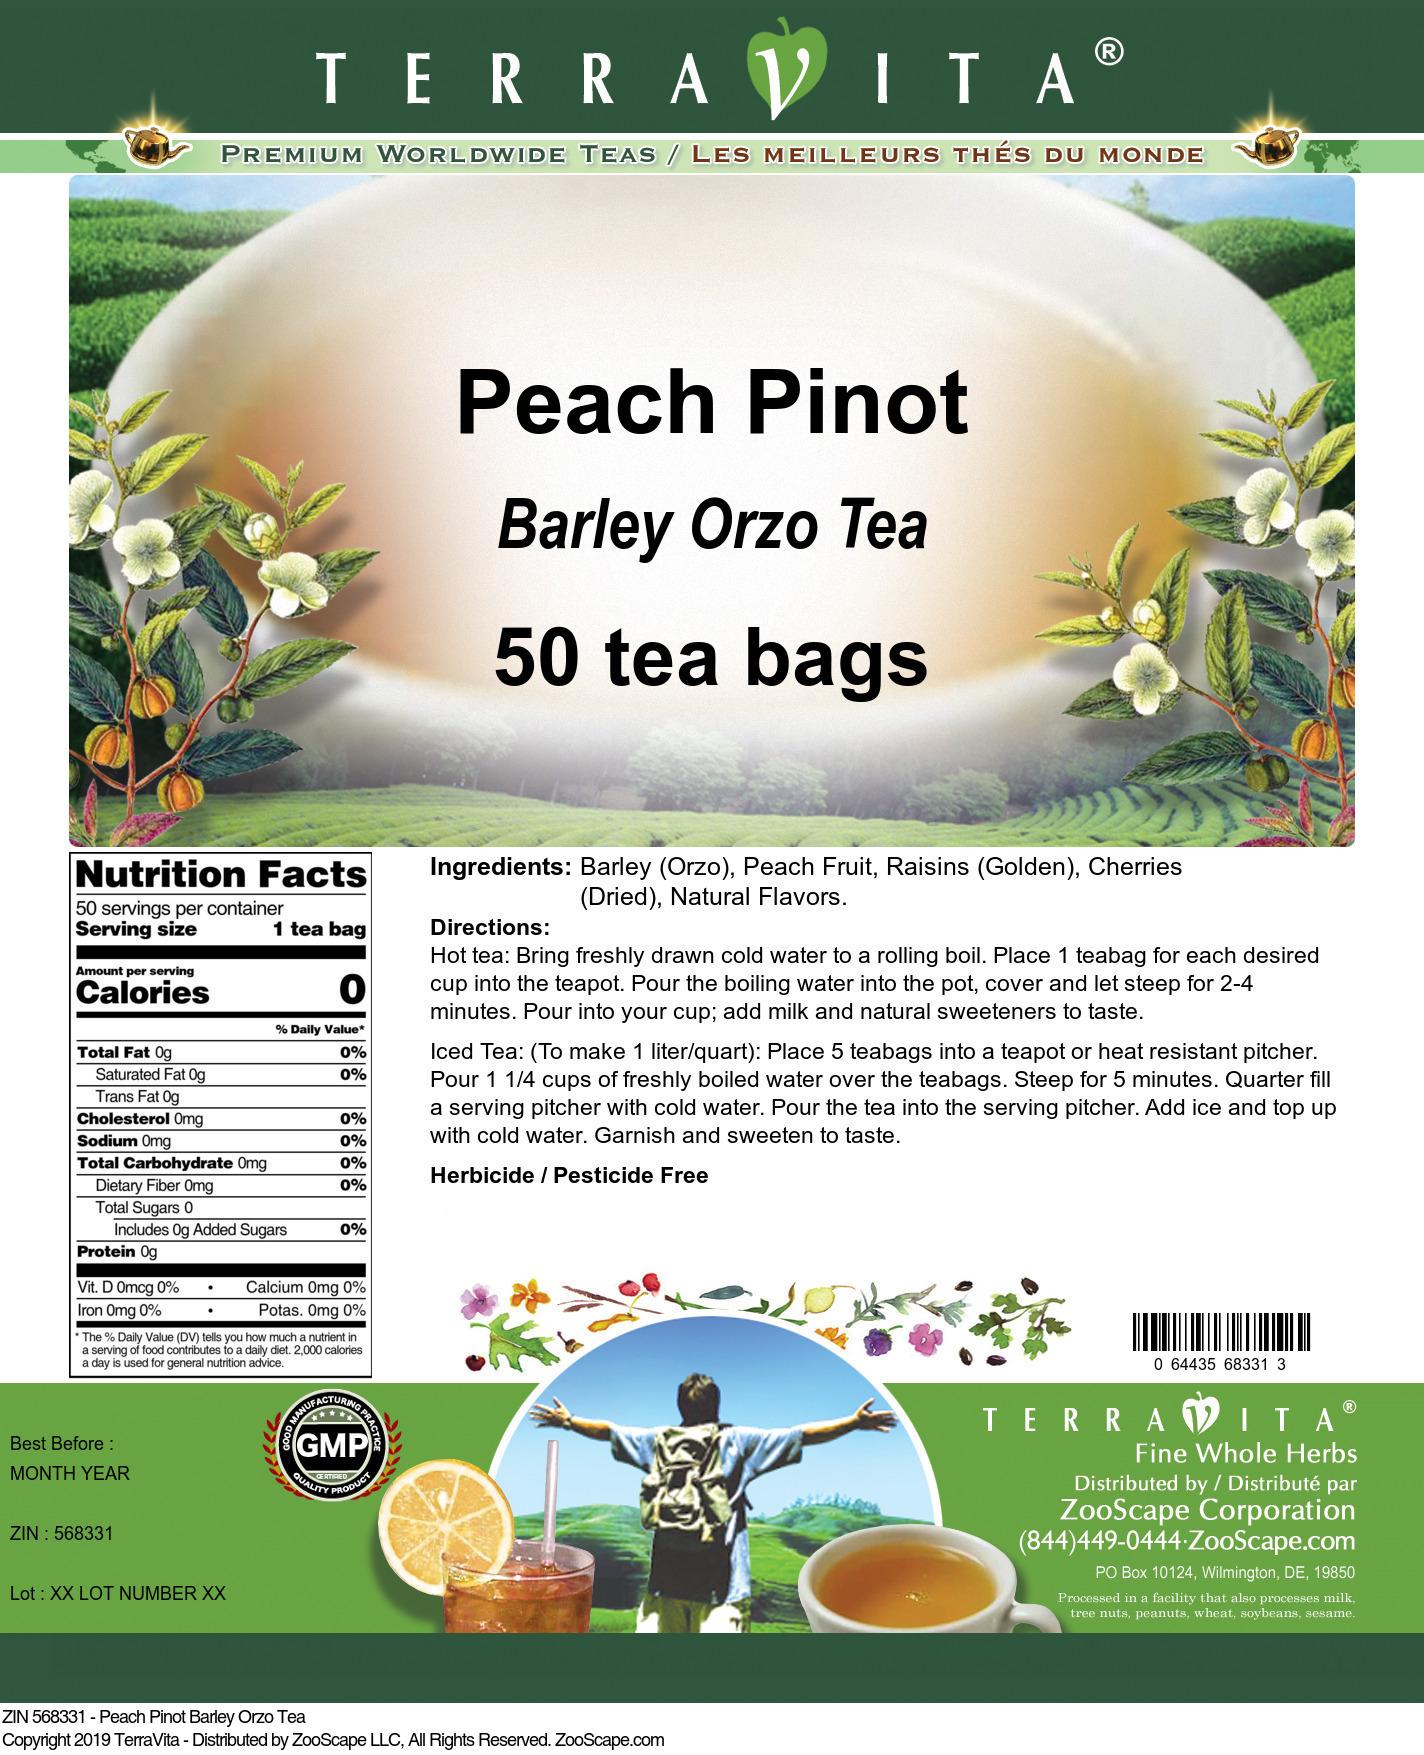 Peach Pinot Barley Orzo Tea